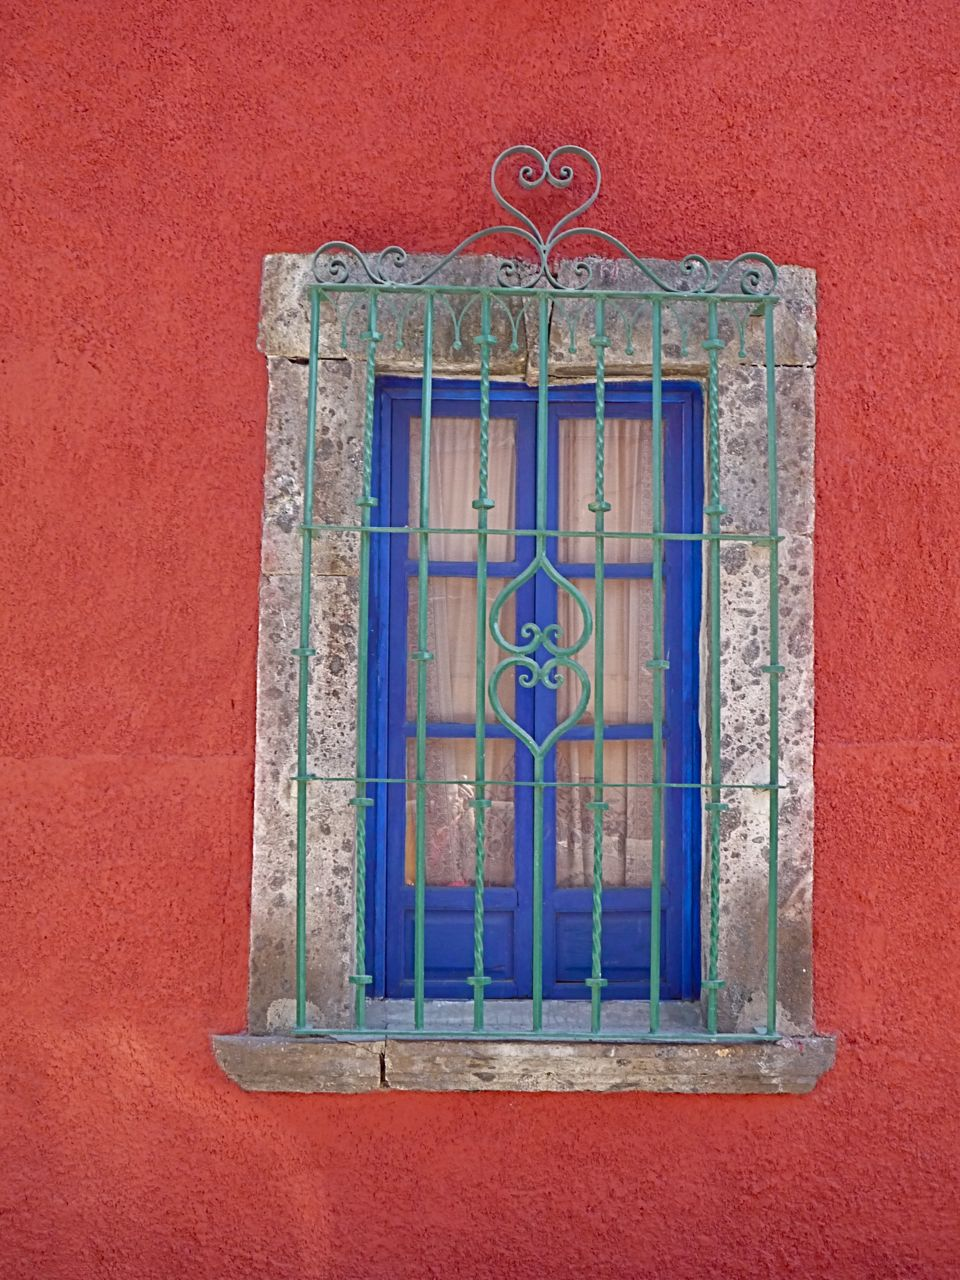 Iron window grate